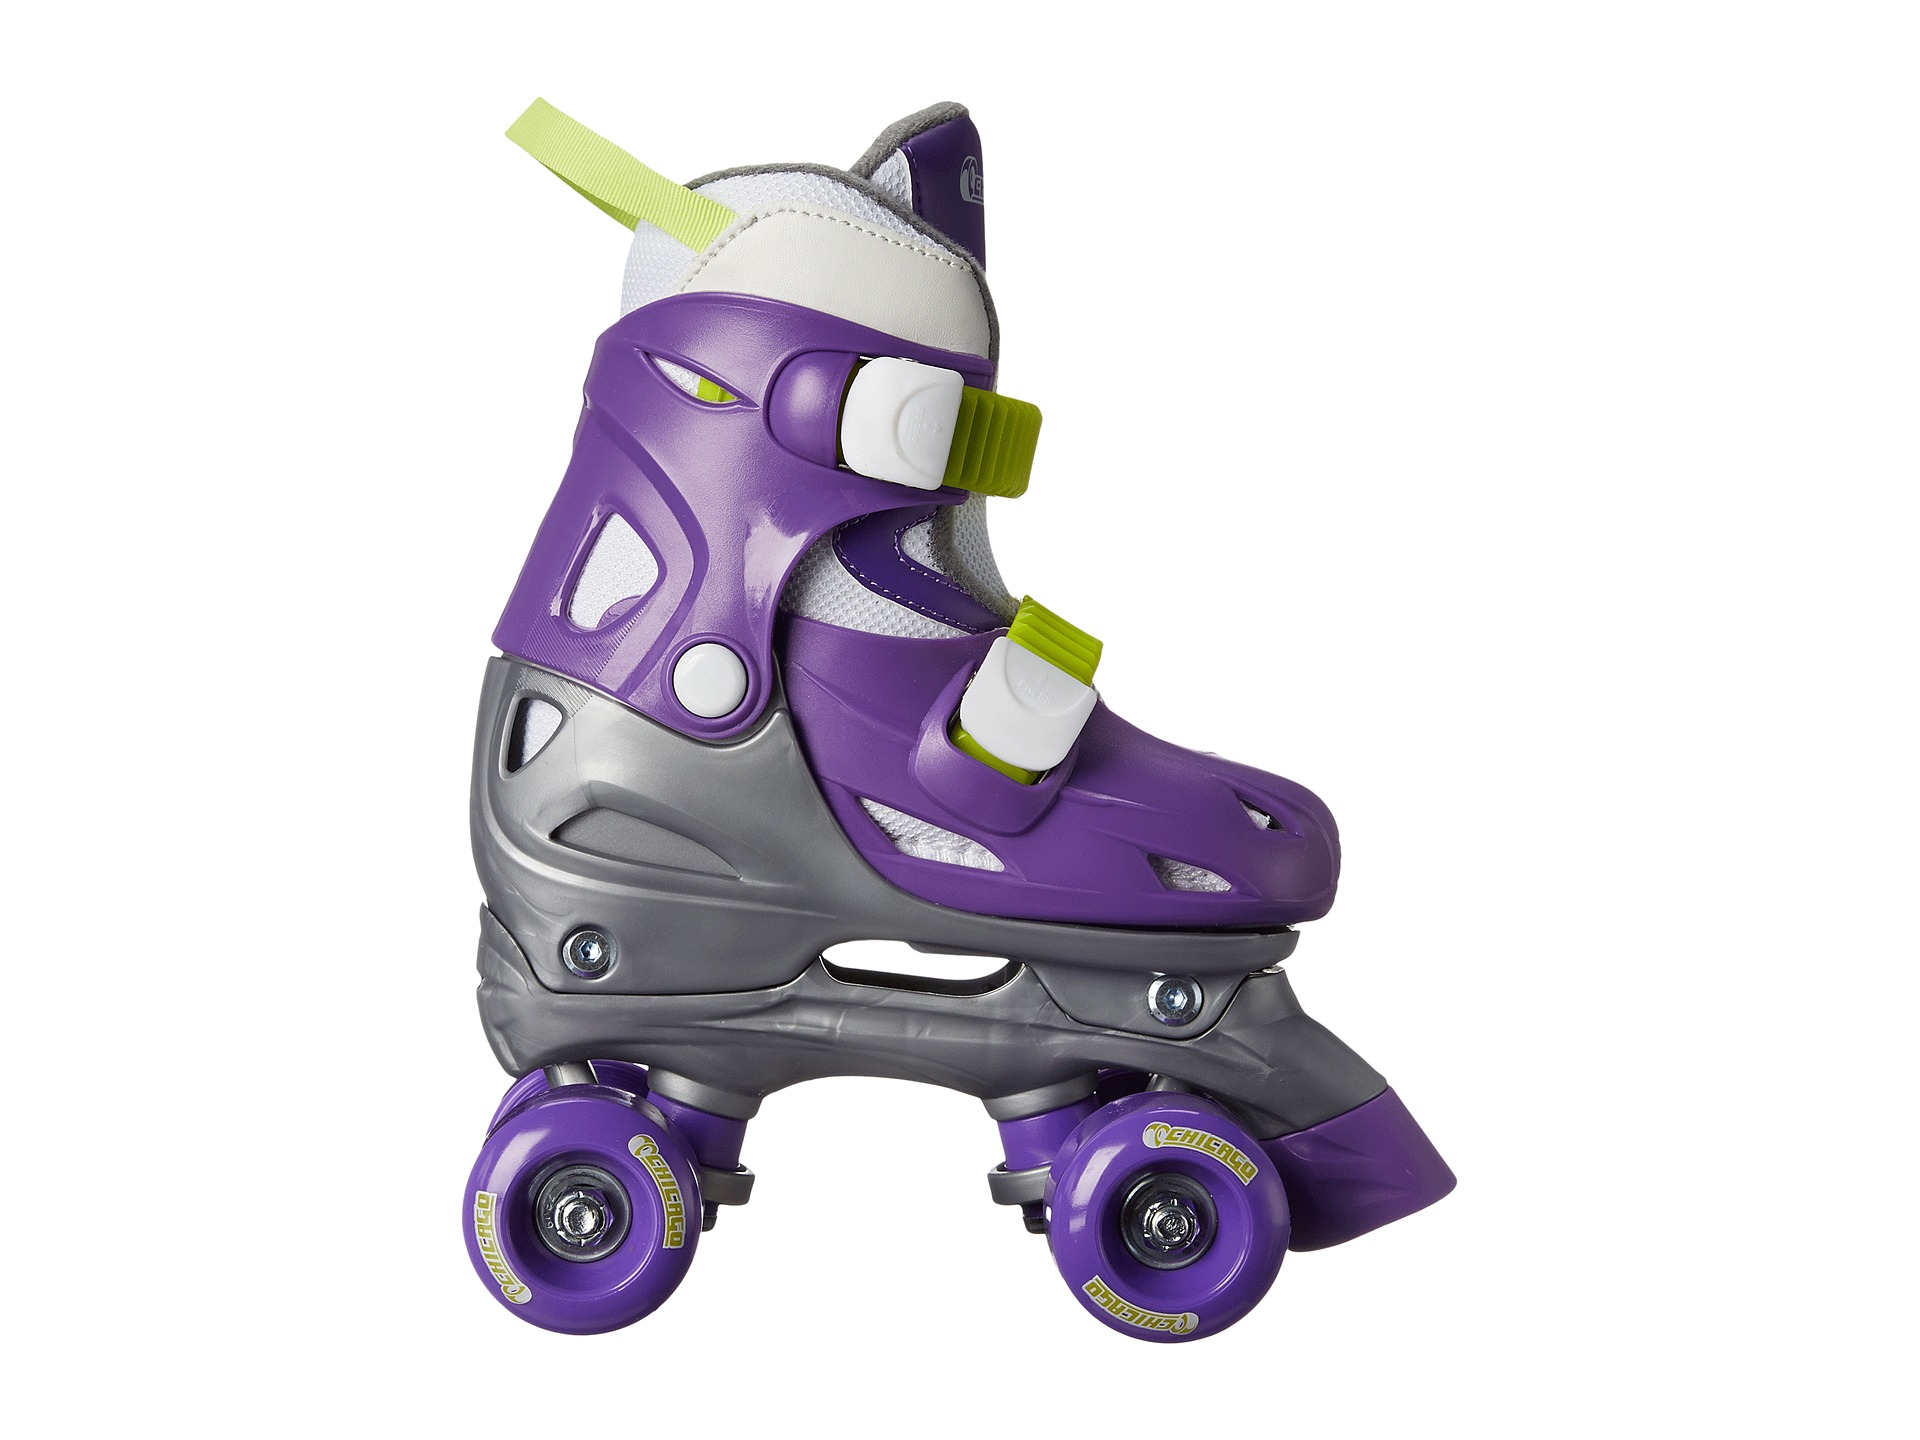 preschool skates chicago skates adjustable toddler kid big kid 560